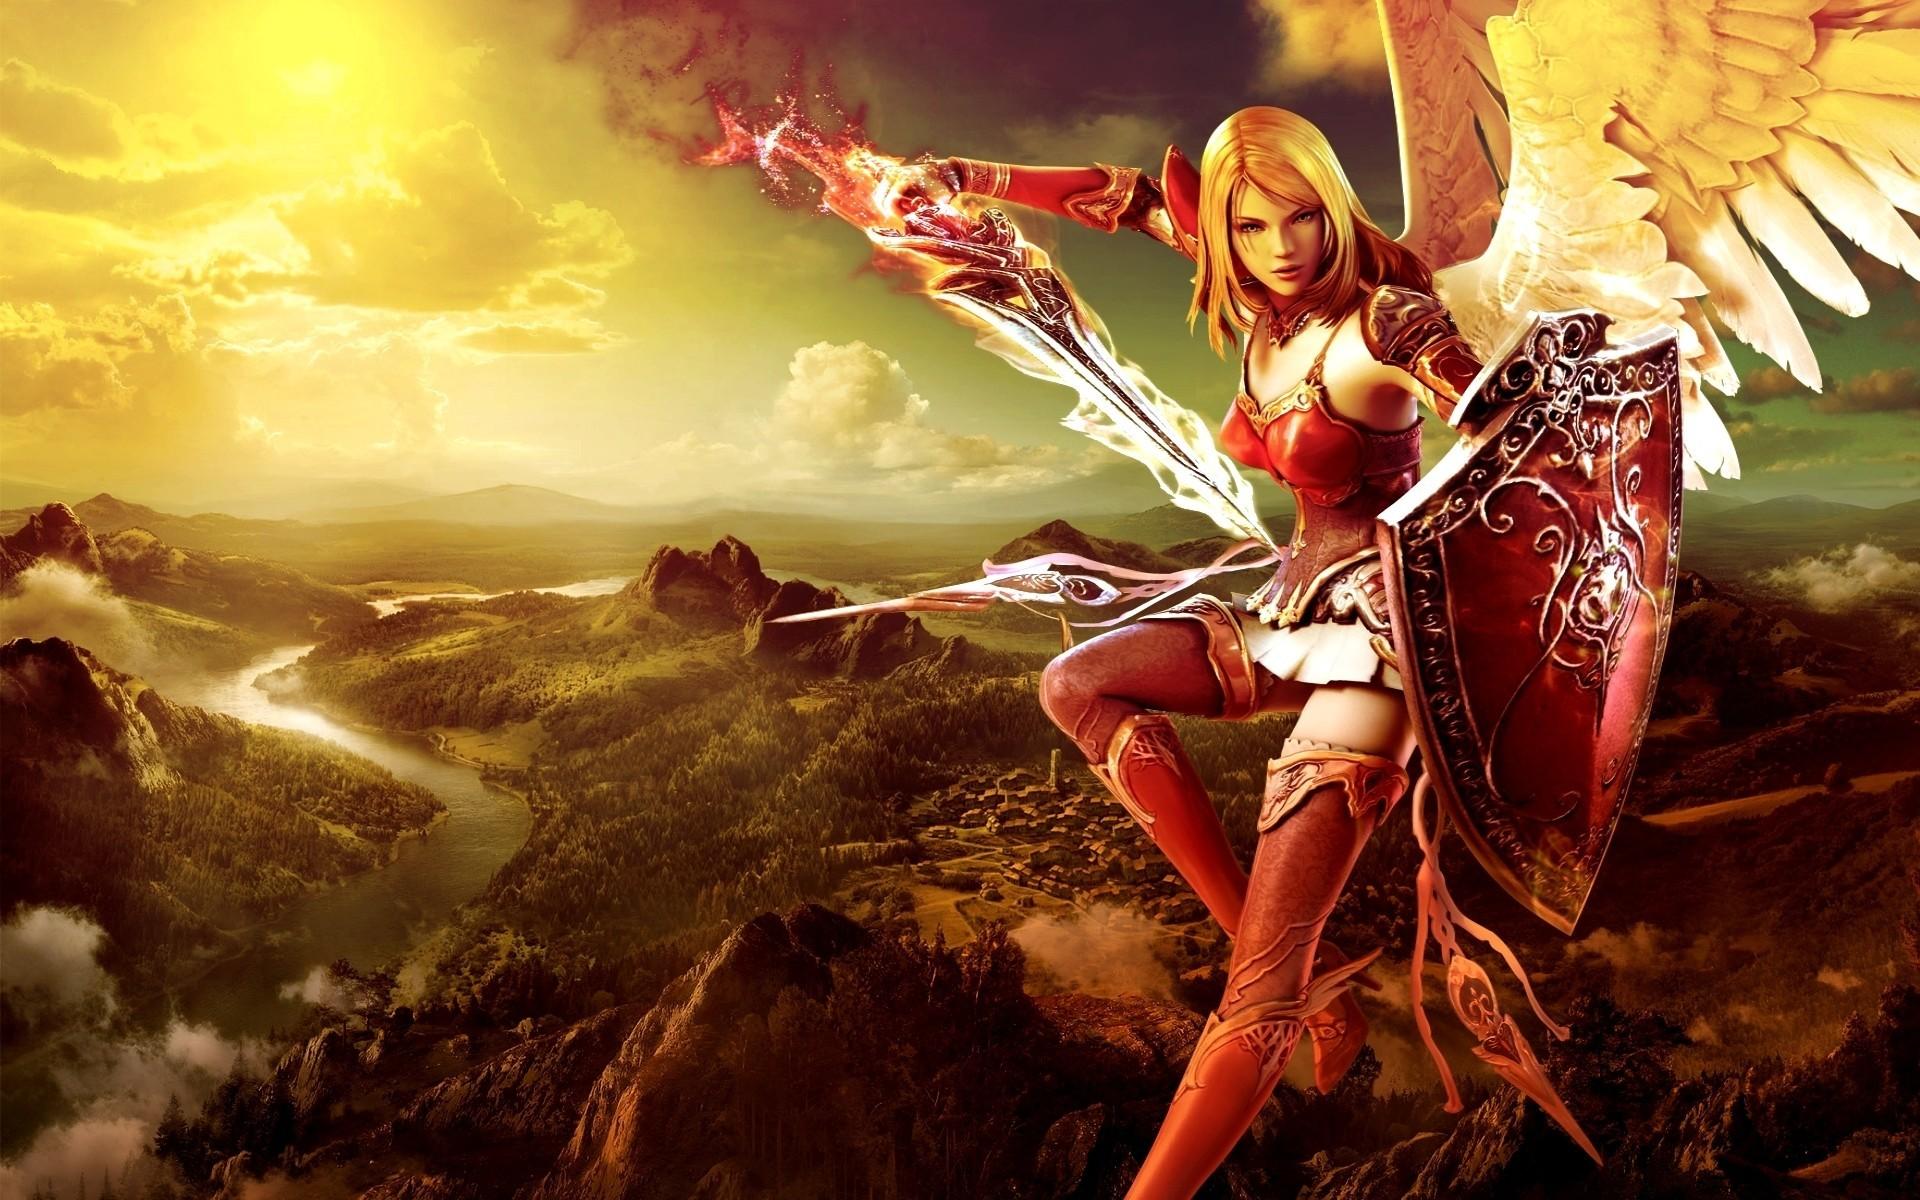 Female Warrior Wallpaper – Wallpaper, High Definition, High Quality .